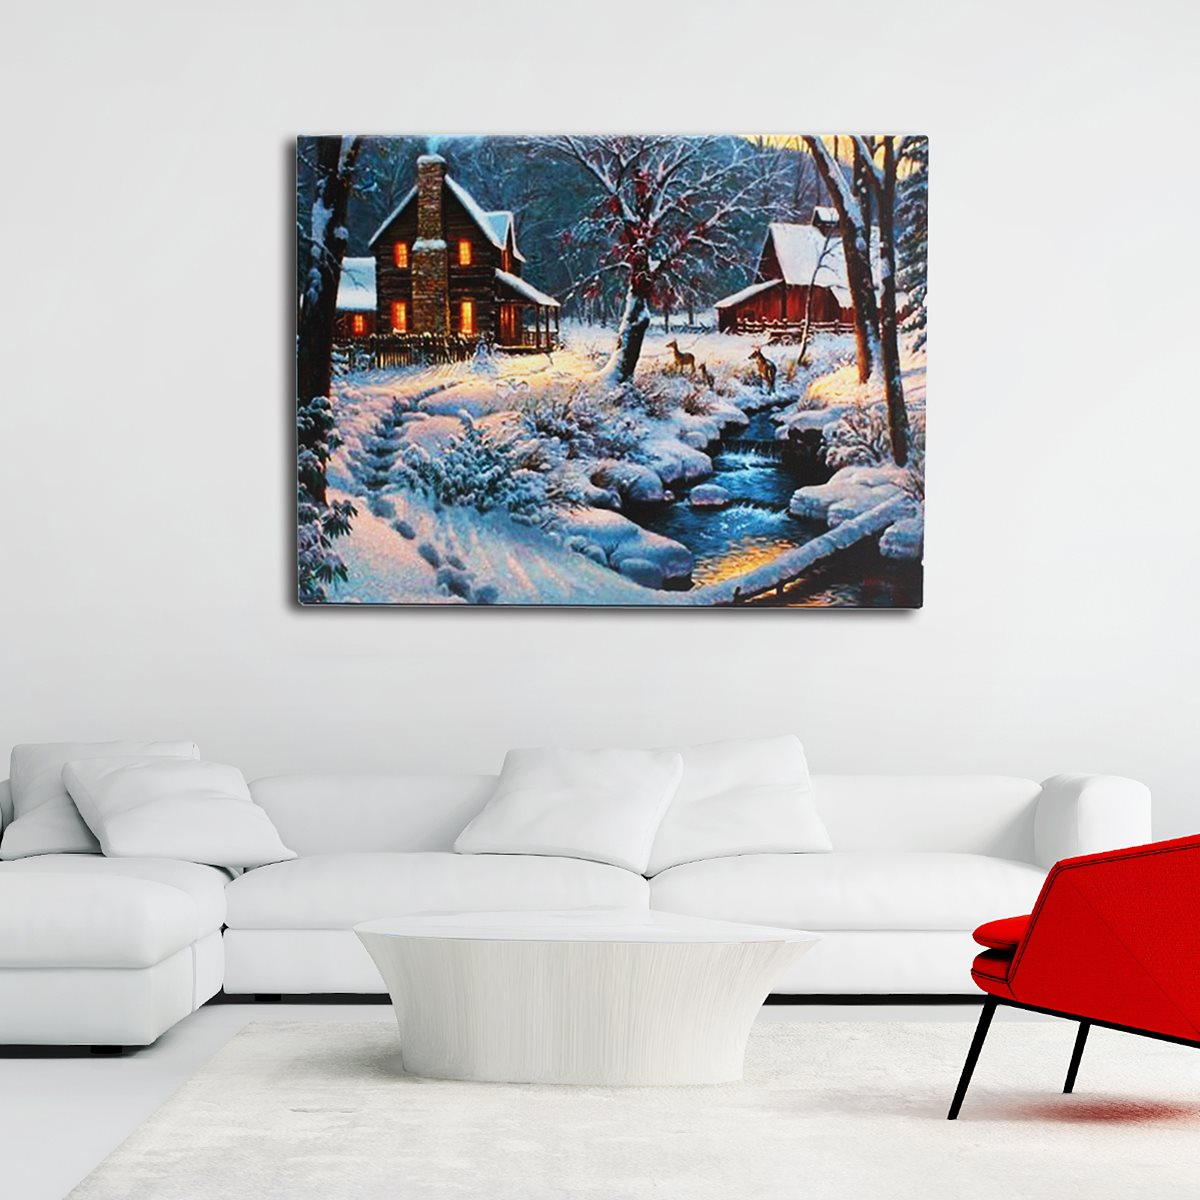 Hiasan Dinding Lukisan Pemandangan Musim Dingin Rumah Light Up